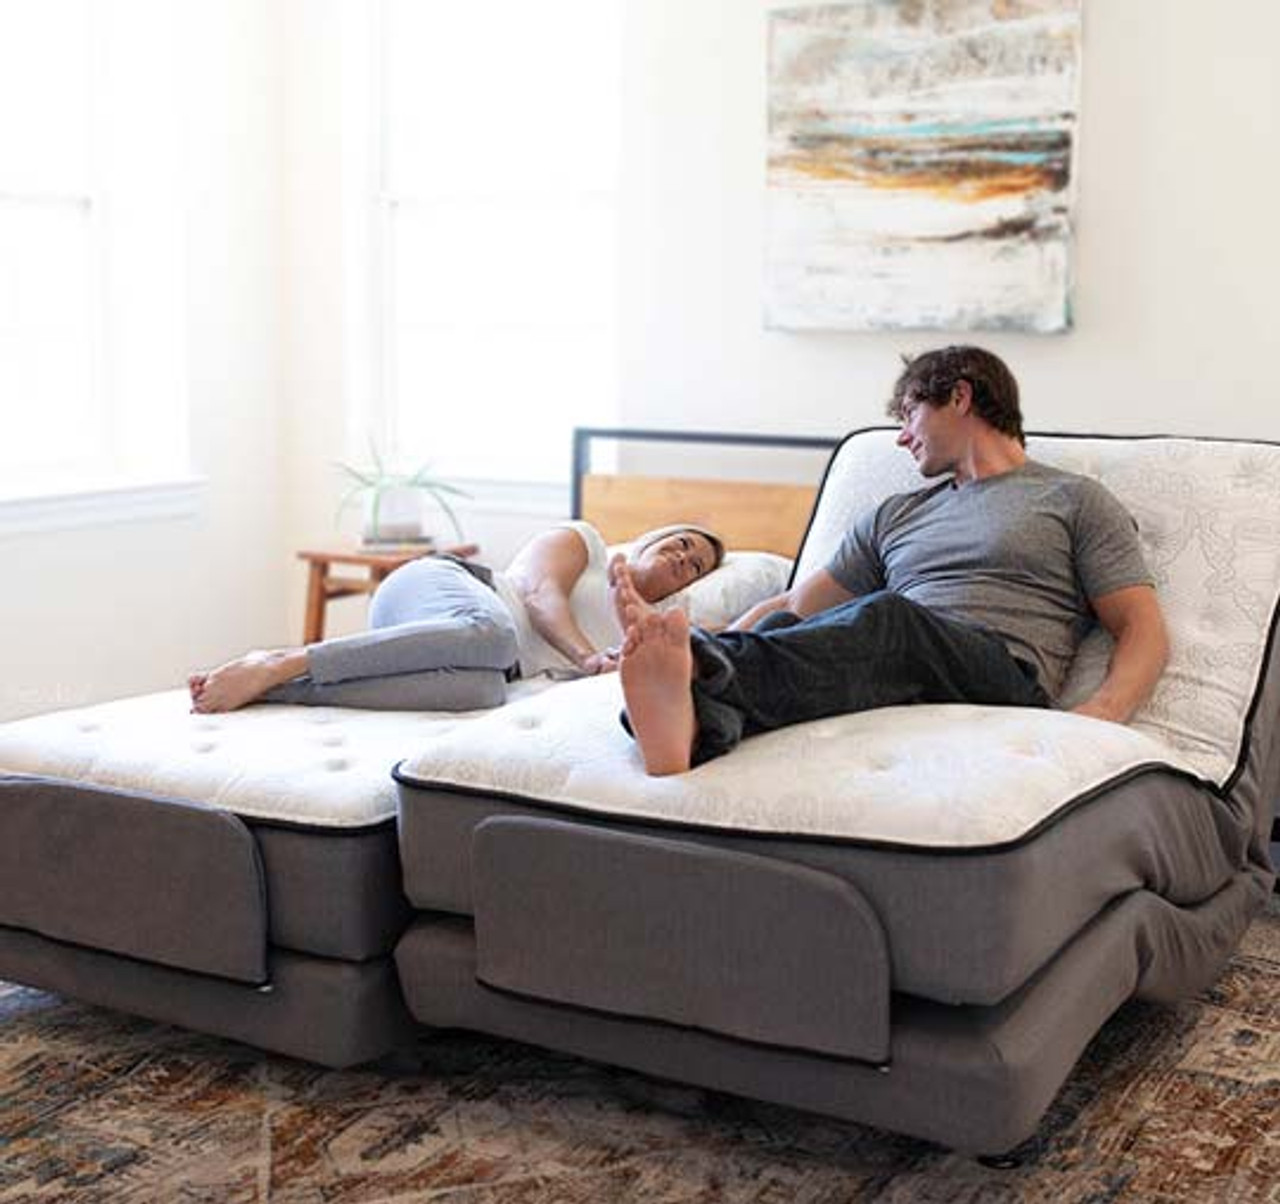 Flex A Bed Adjustable Hospital Beds Premier Twin Full Split Queen Split King